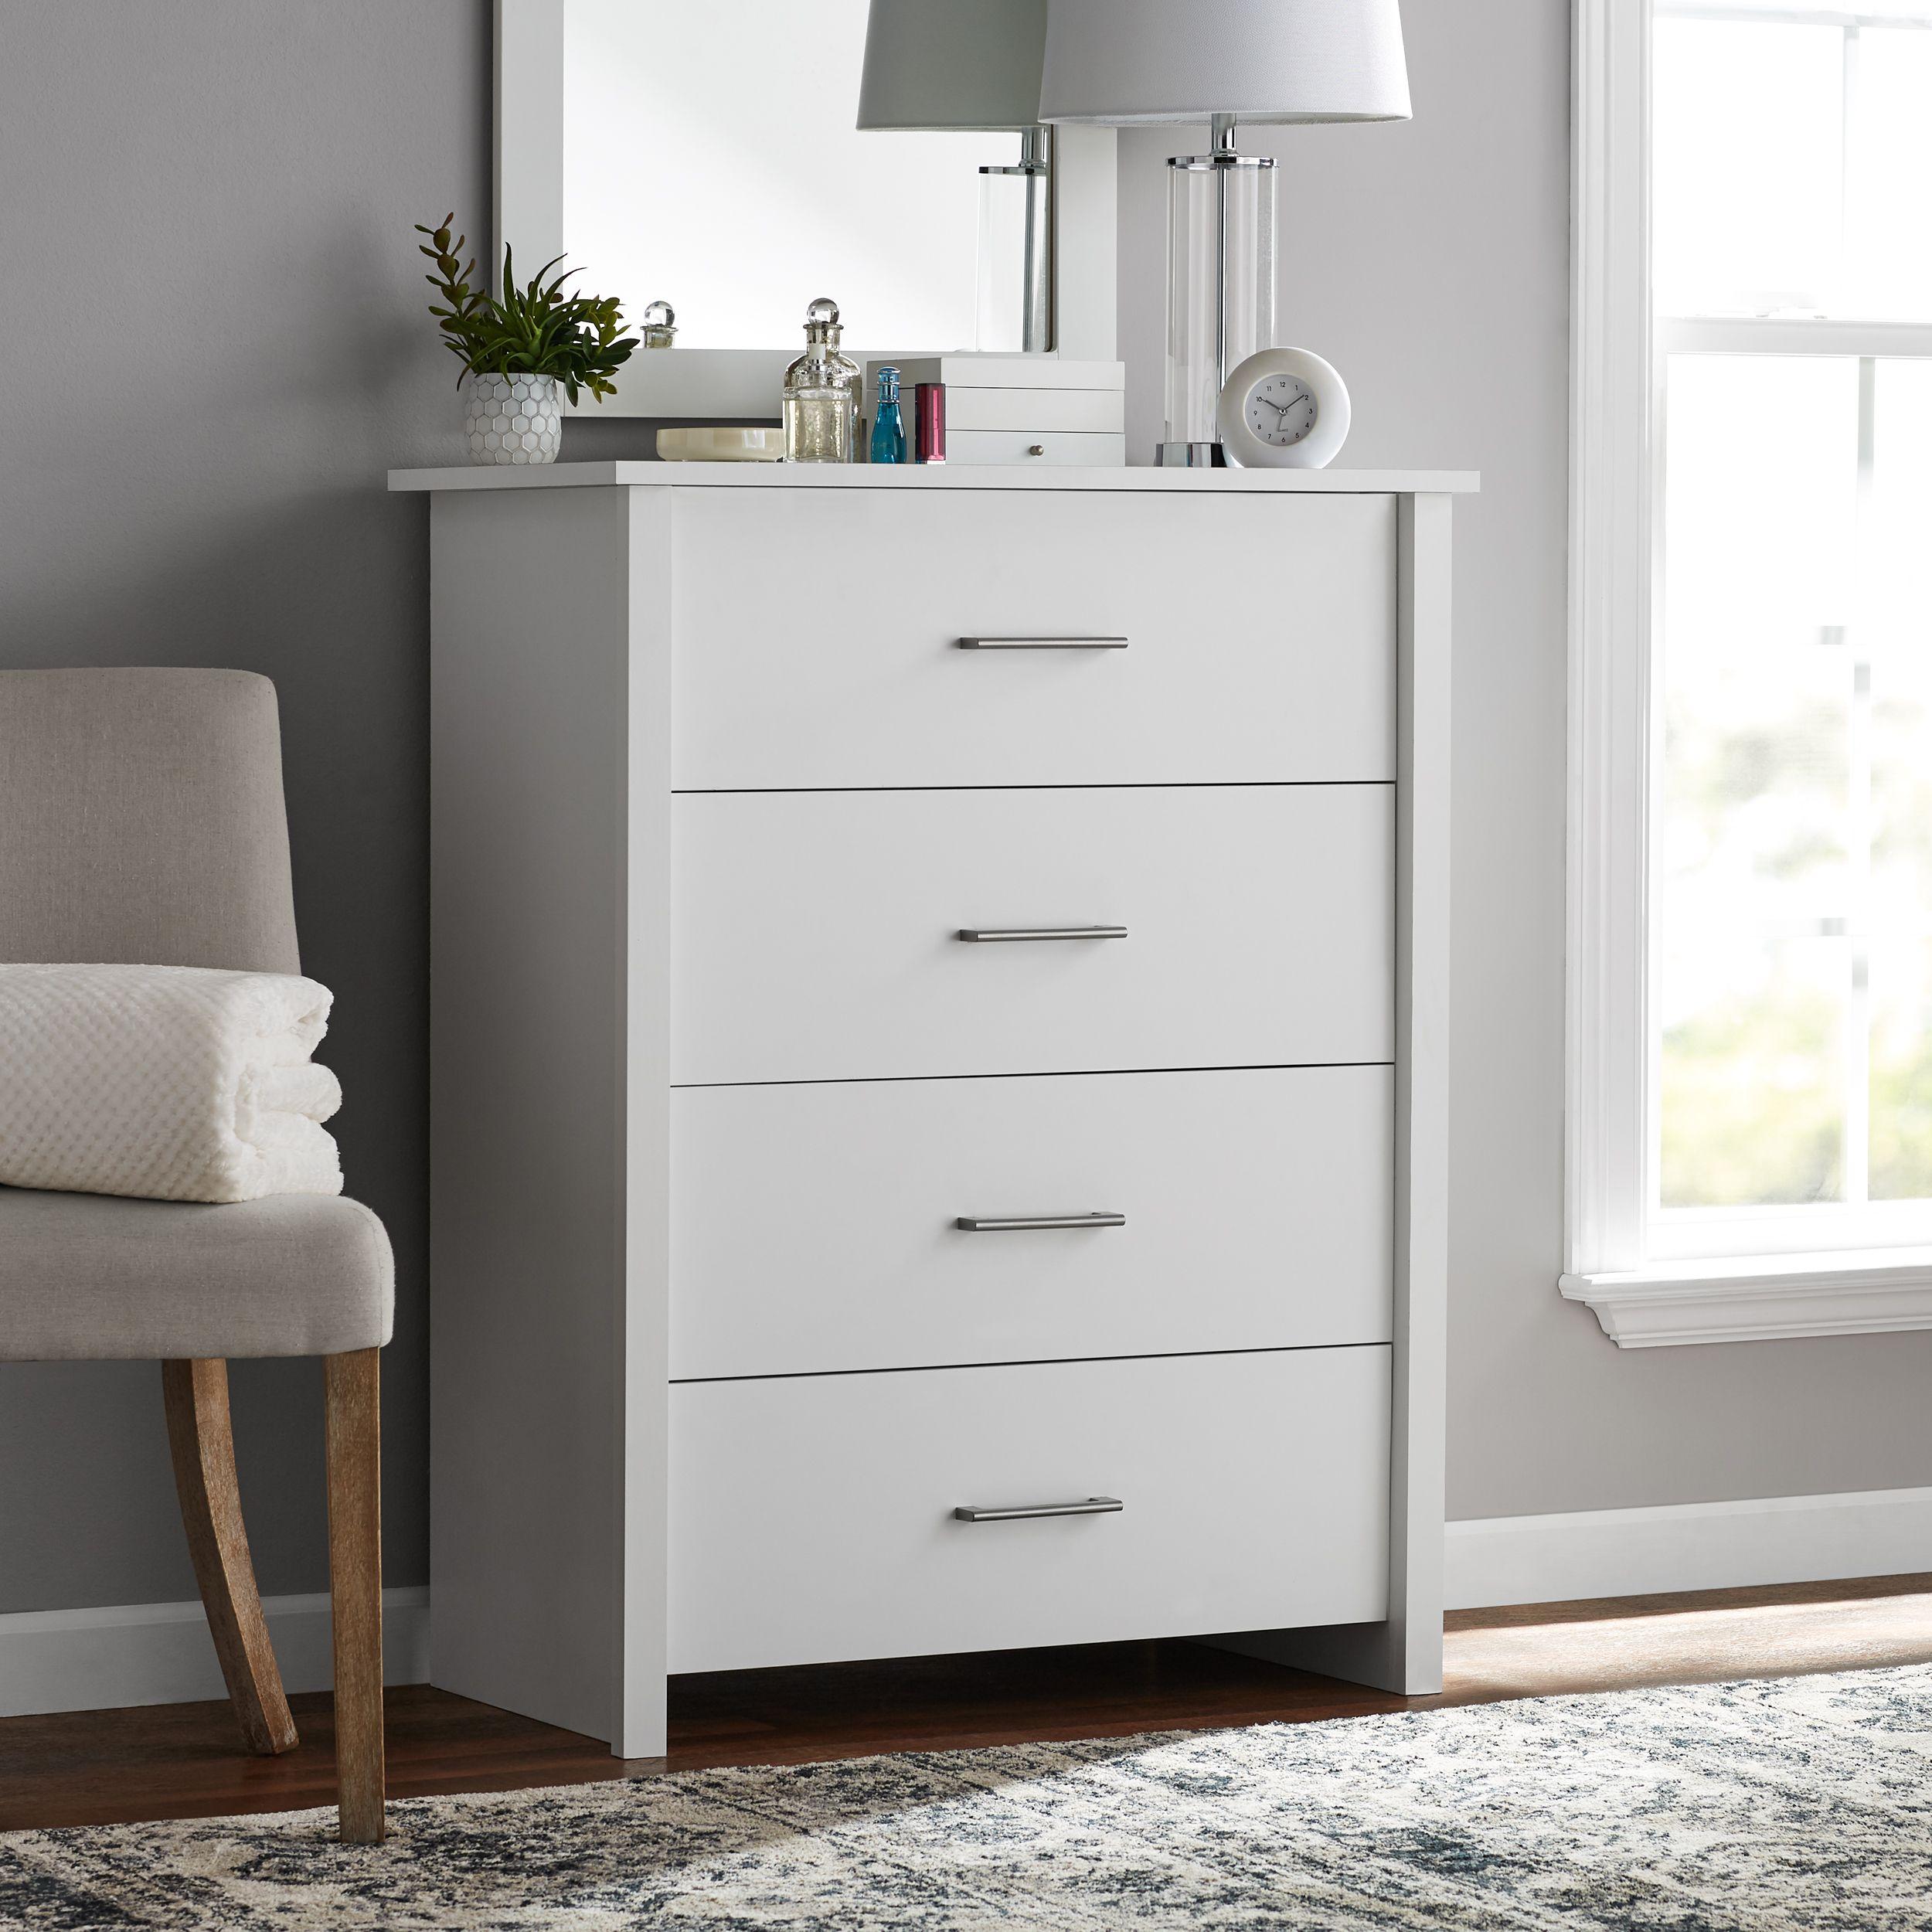 Mainstays Hillside 4 Drawer Dresser Soft White Finish Walmart Com In 2021 Dresser Drawers 4 Drawer Dresser Bedroom Chest Of Drawers 4 drawer chest of drawers